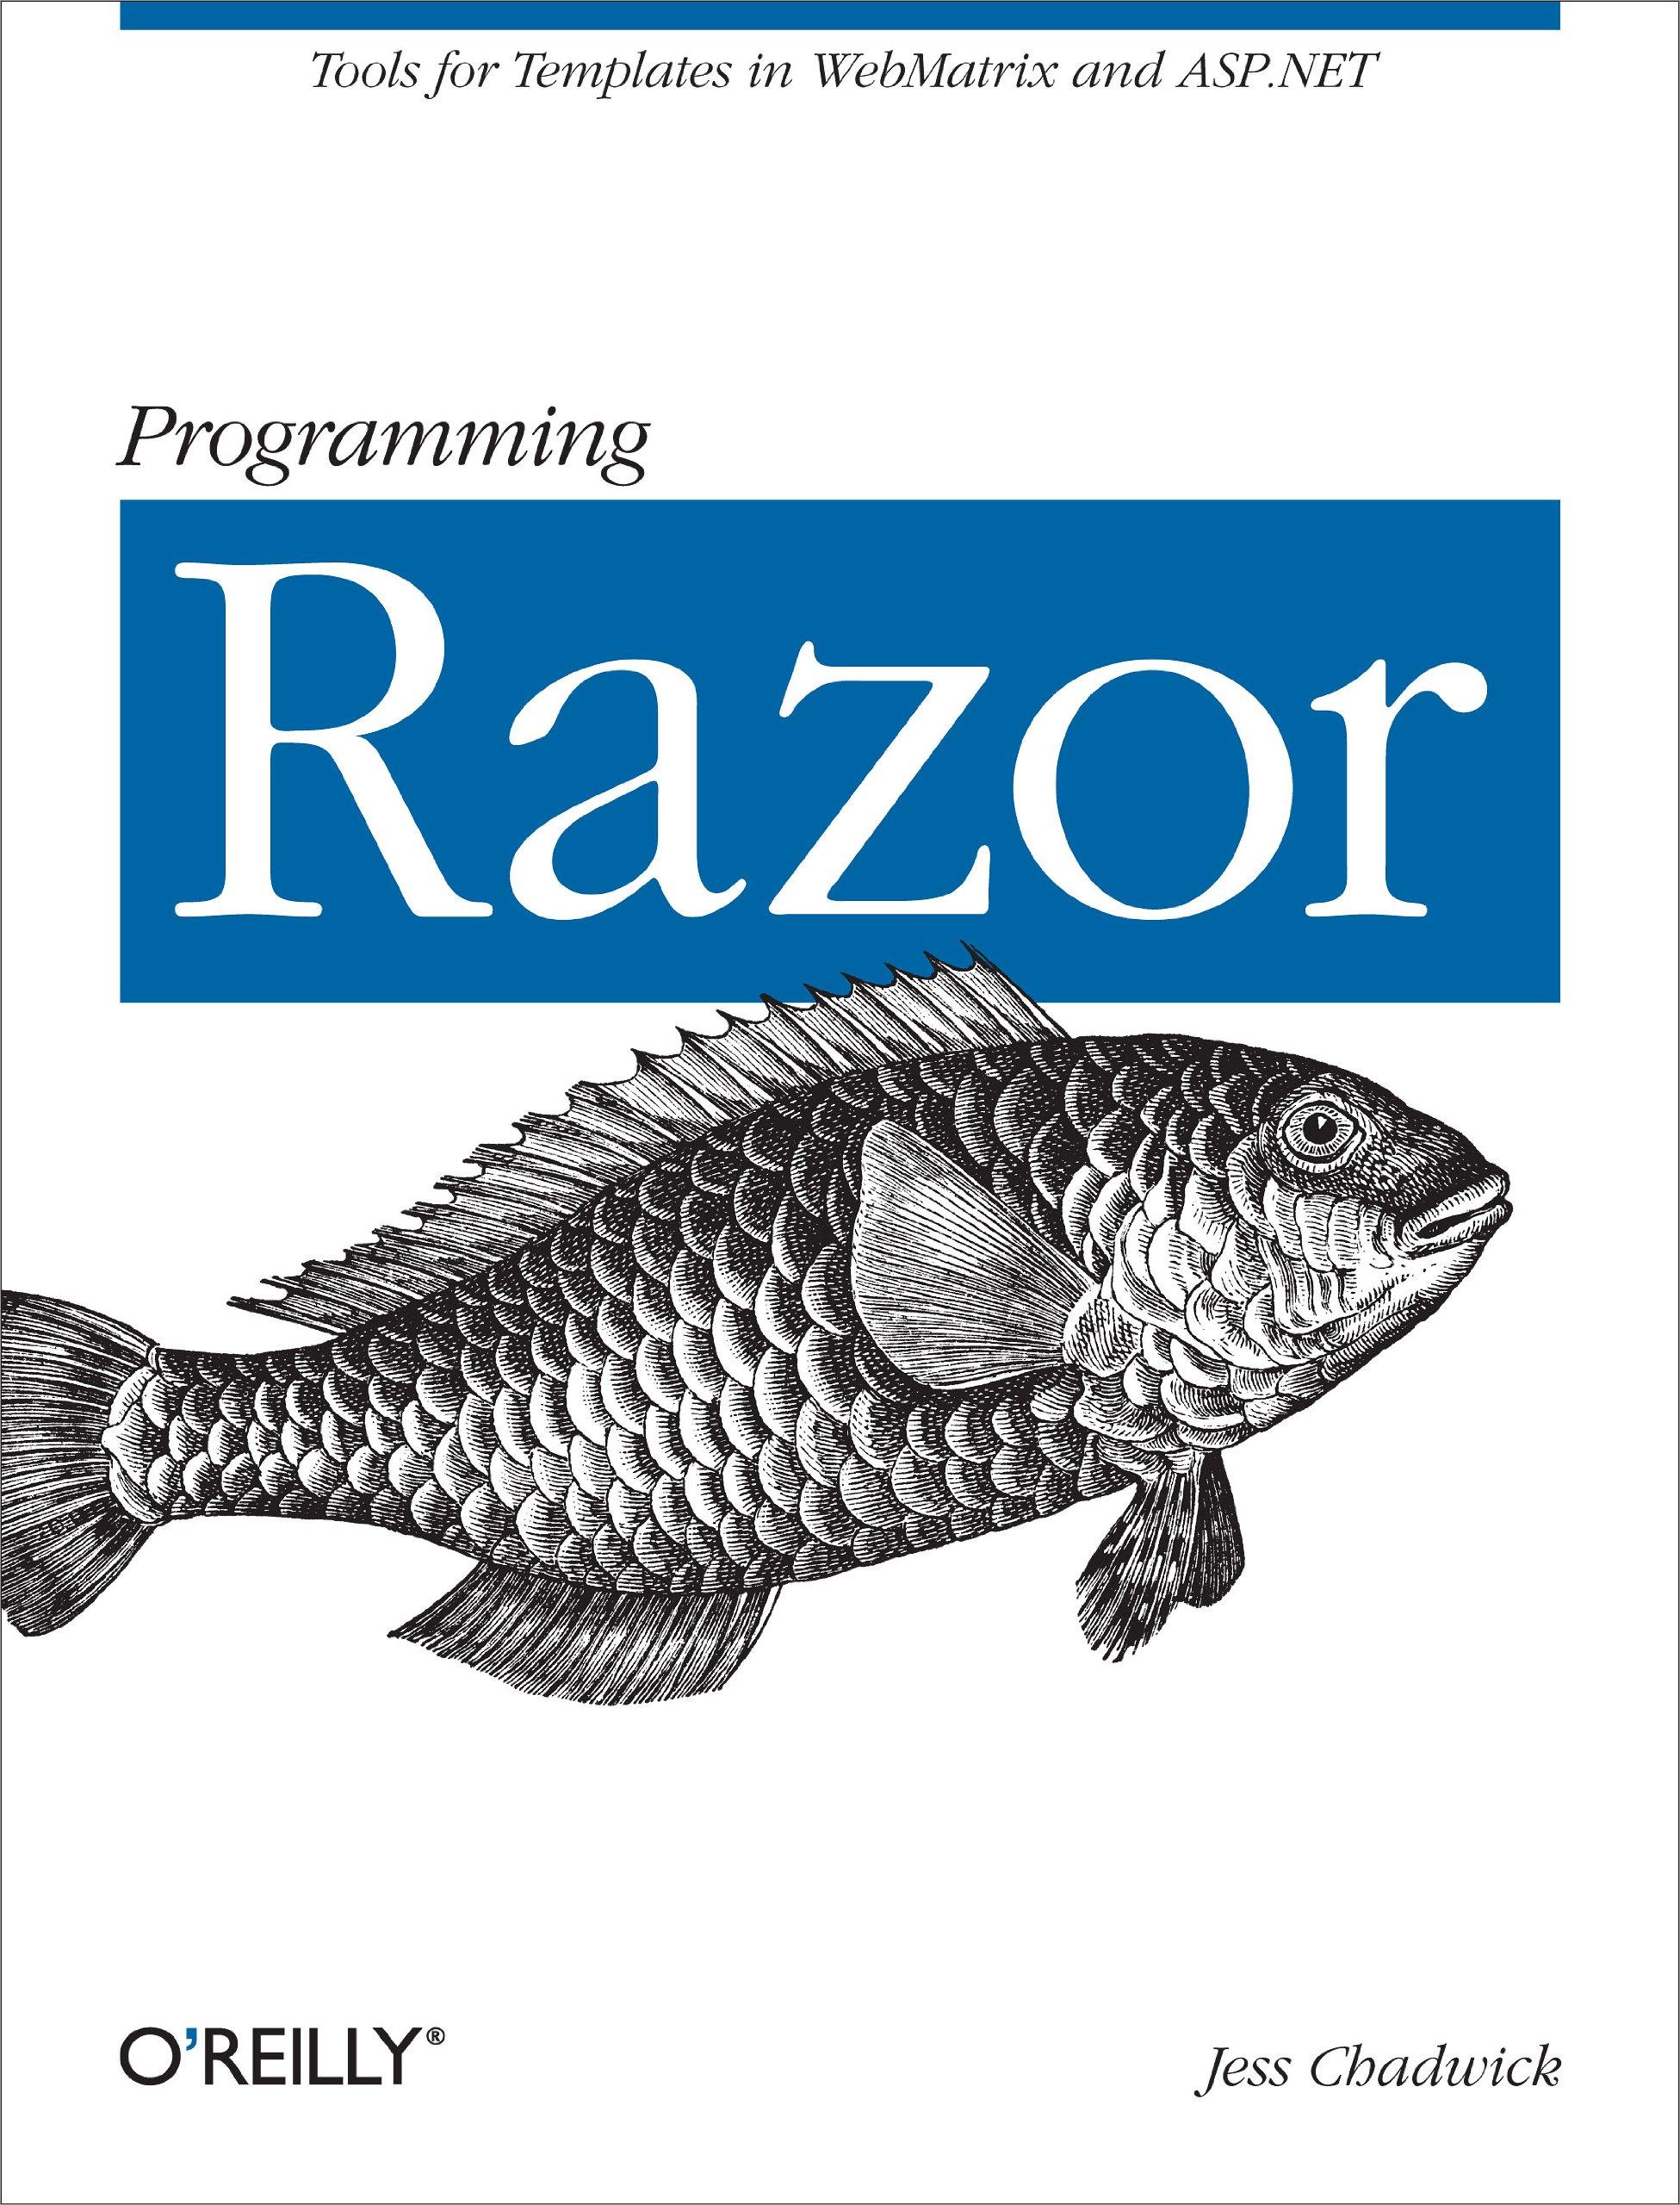 amazon programming razor tools for templates in asp net mvc or